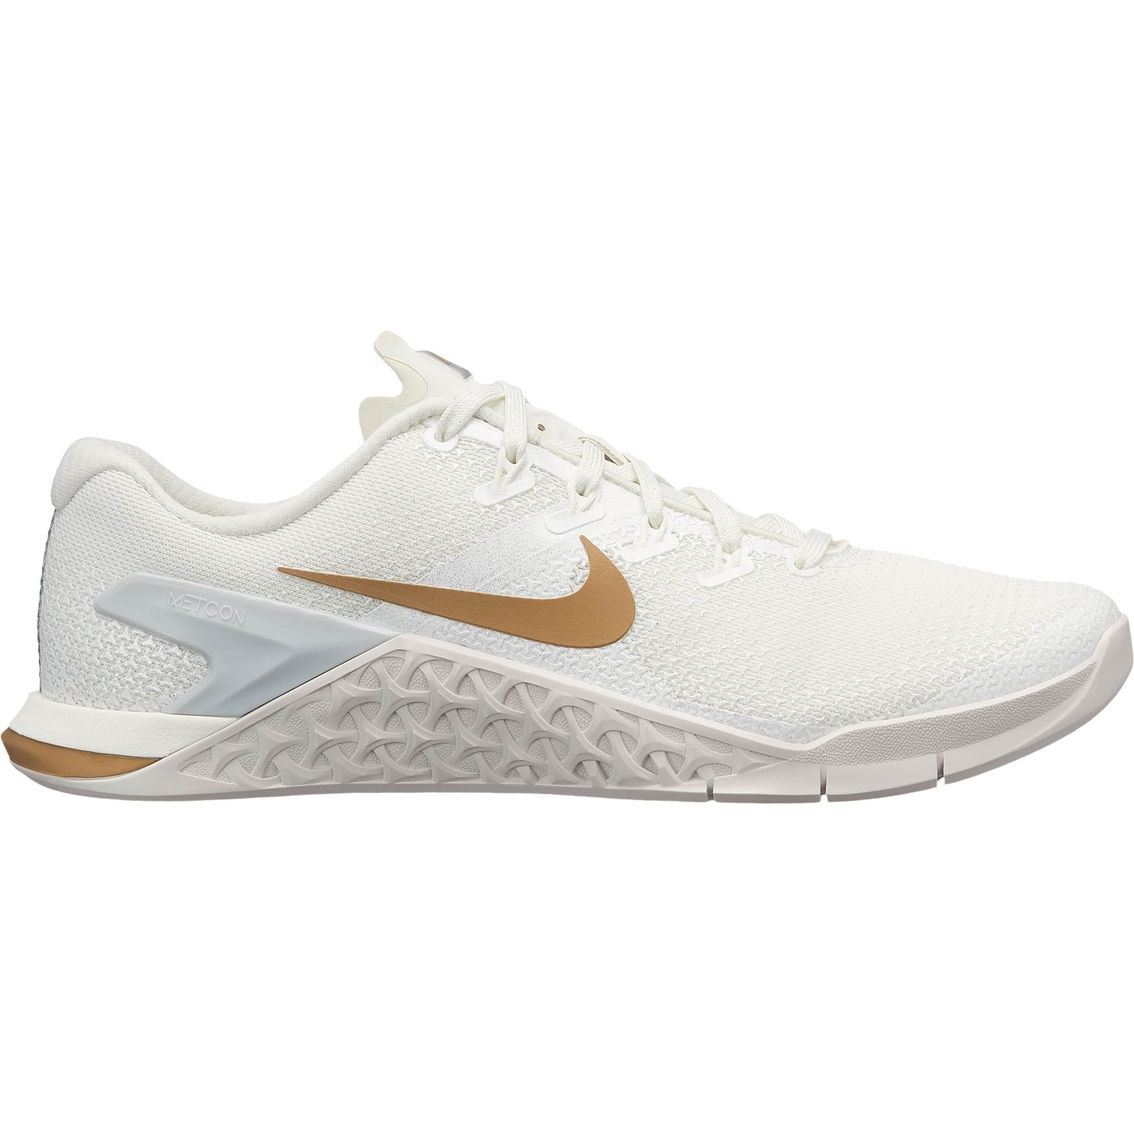 29d603b916c Nike Metcon 4 Champagne Women s Training Shoes